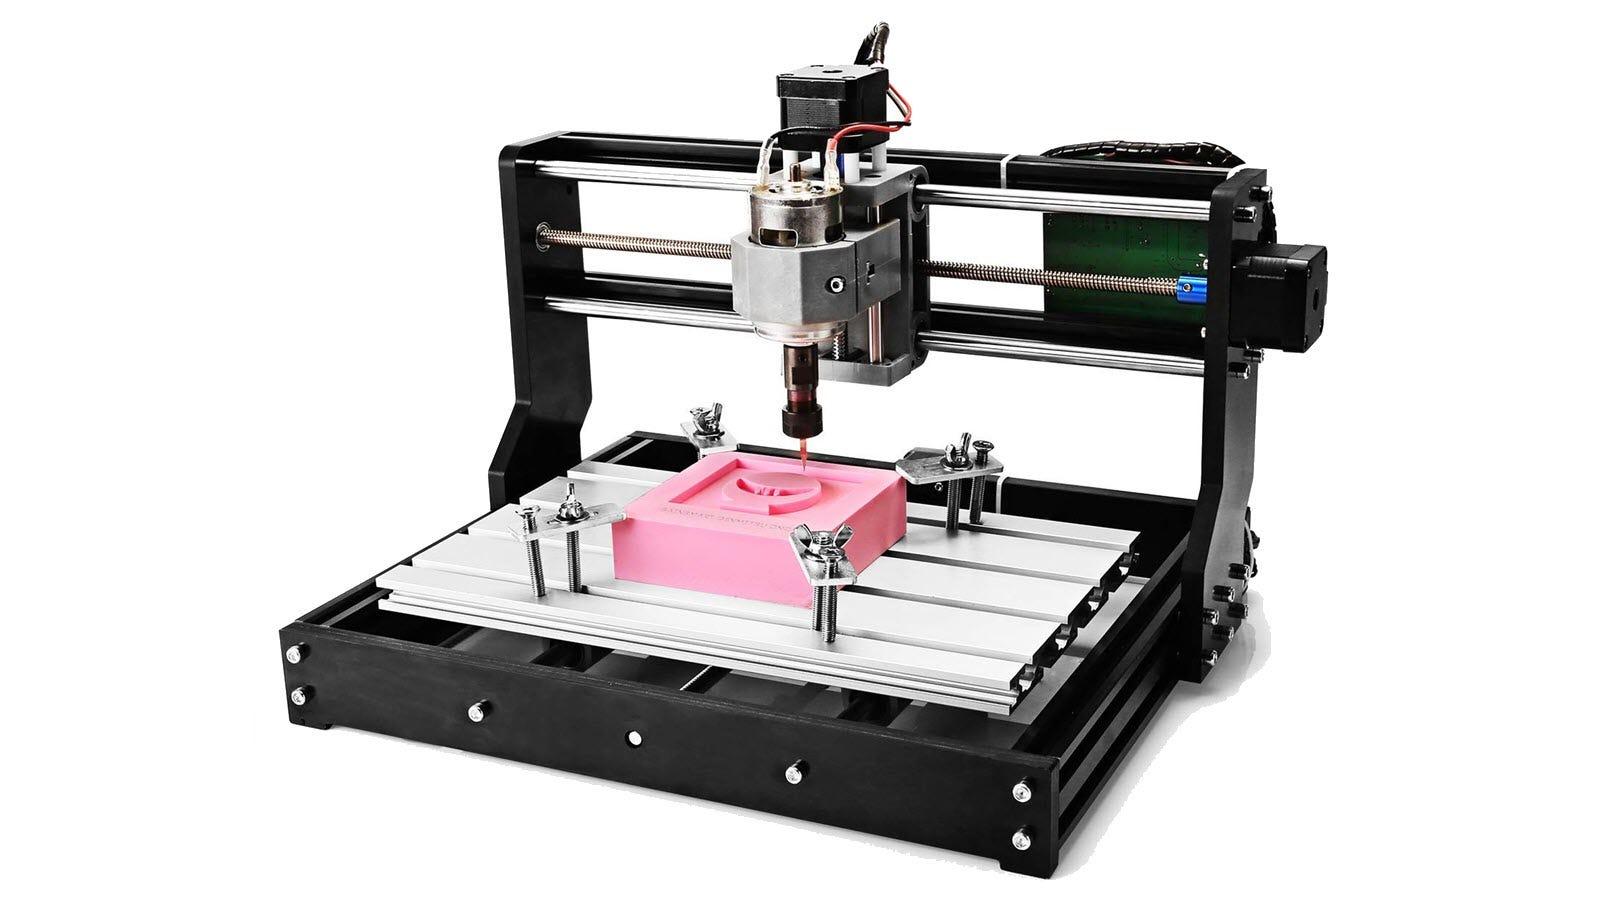 A Genmitsu CNC 3018-PRO cutting into a small pink block.